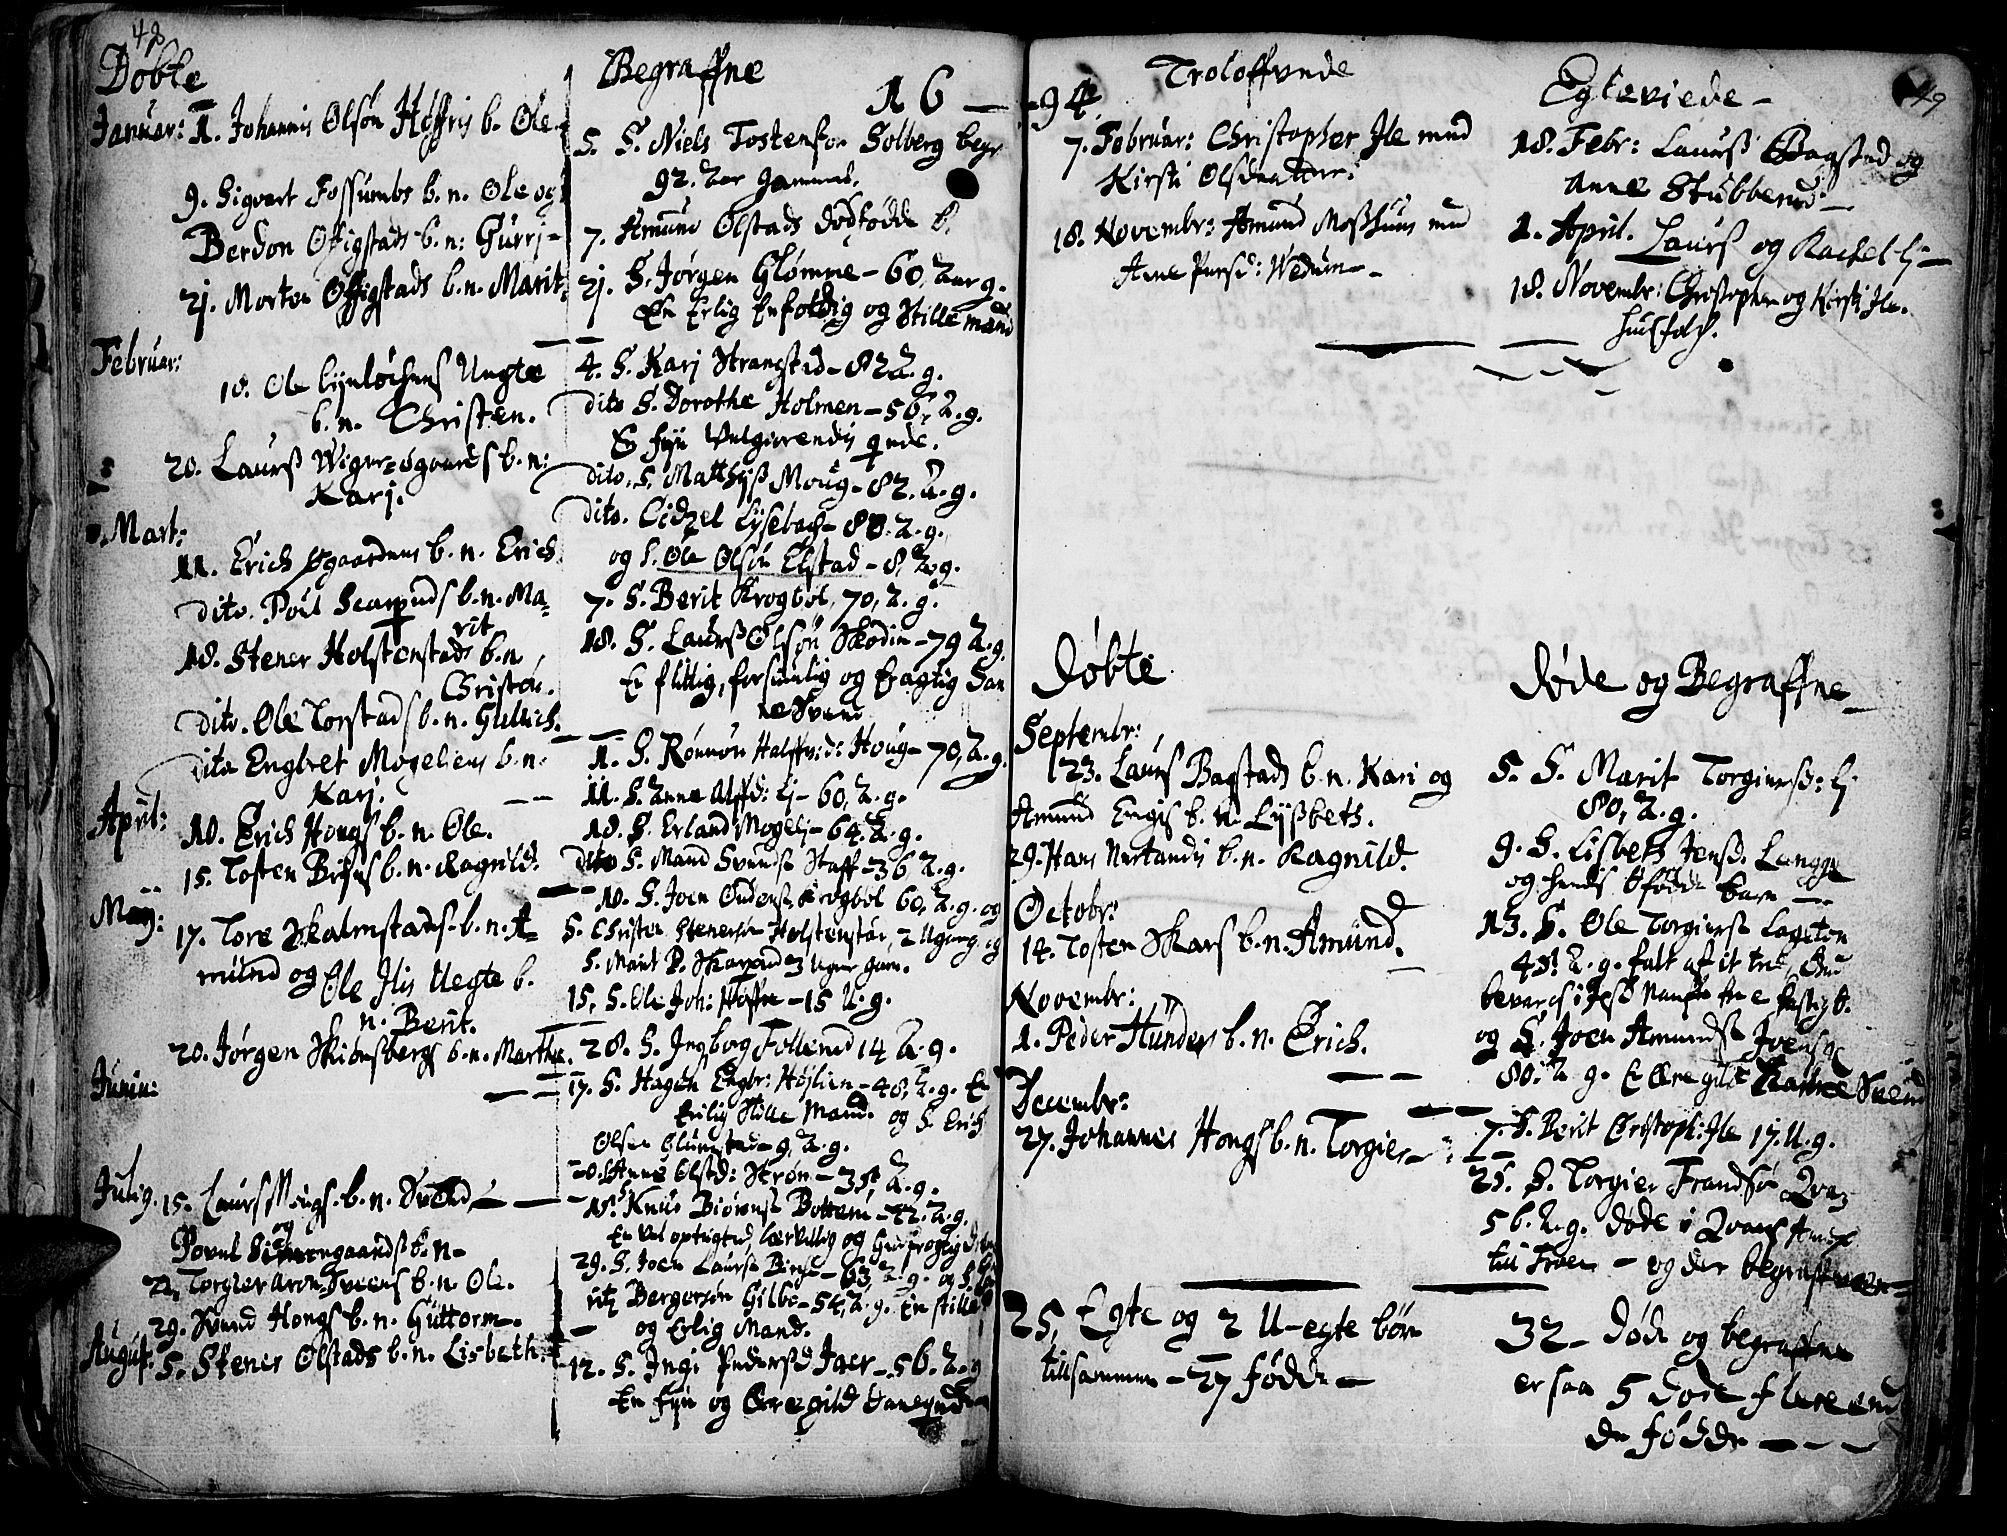 SAH, Øyer prestekontor, Ministerialbok nr. 1, 1671-1727, s. 48-49